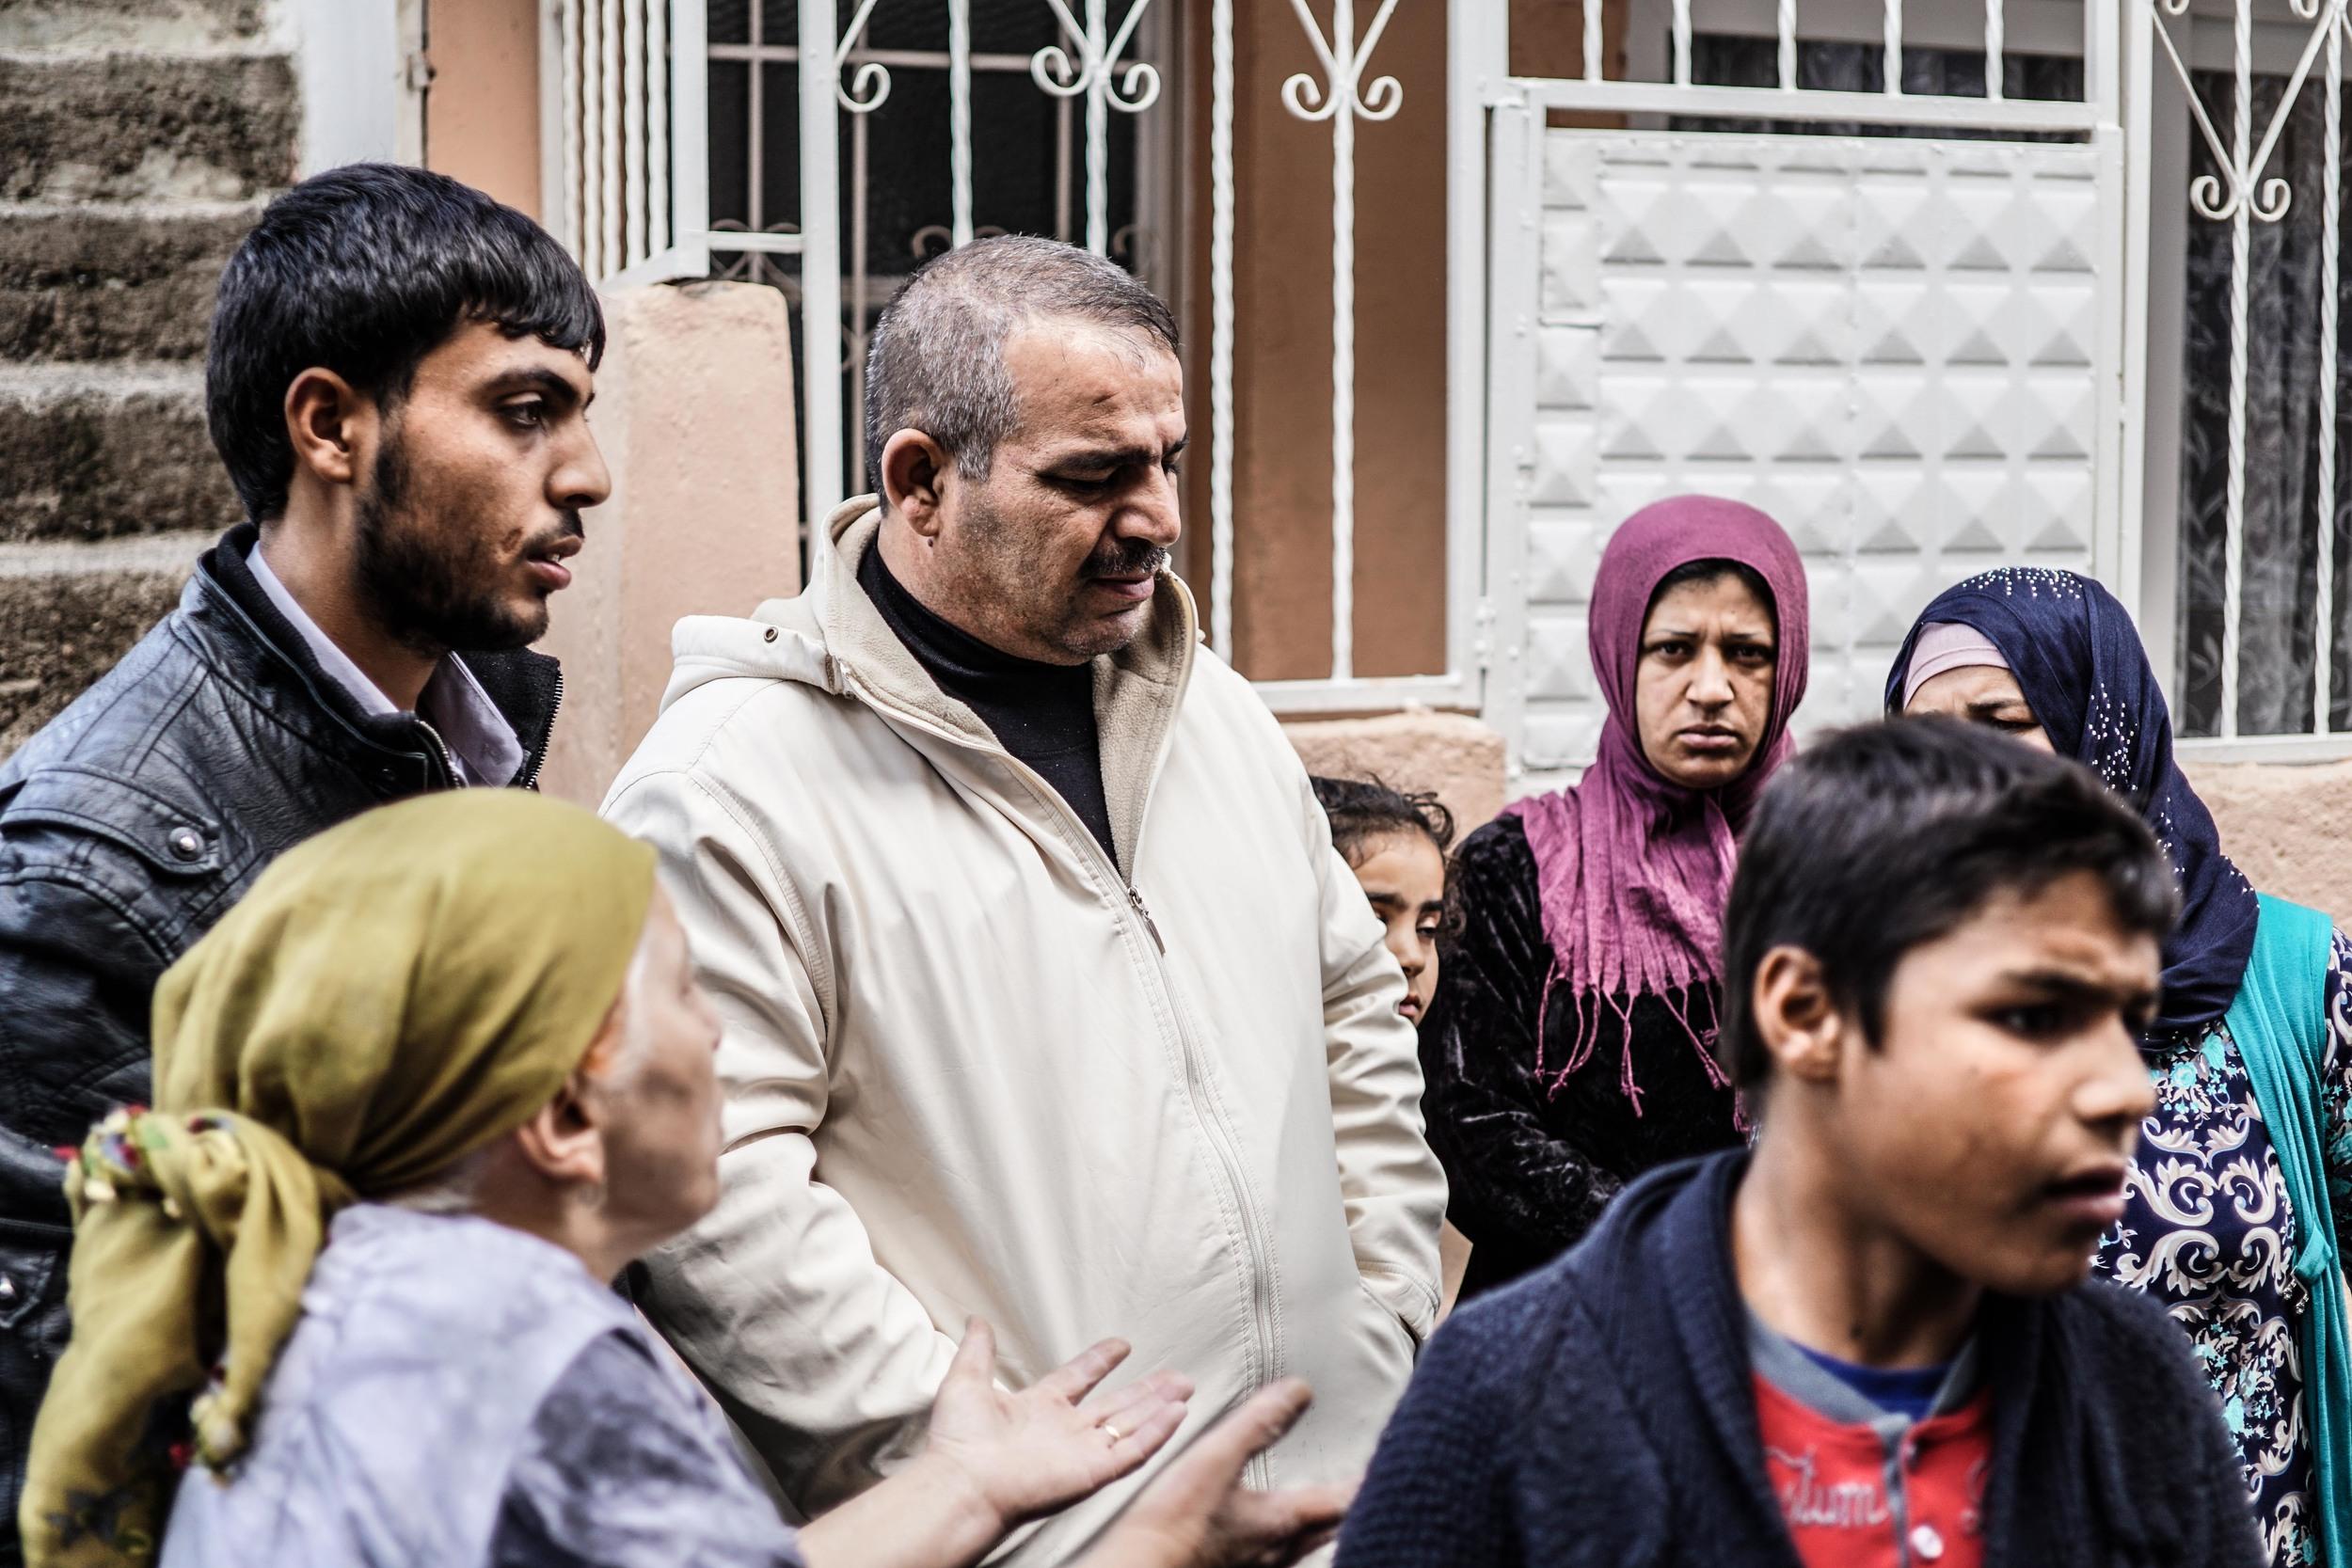 Syrian Refugee Crisis Izmir November 2015 2.jpg